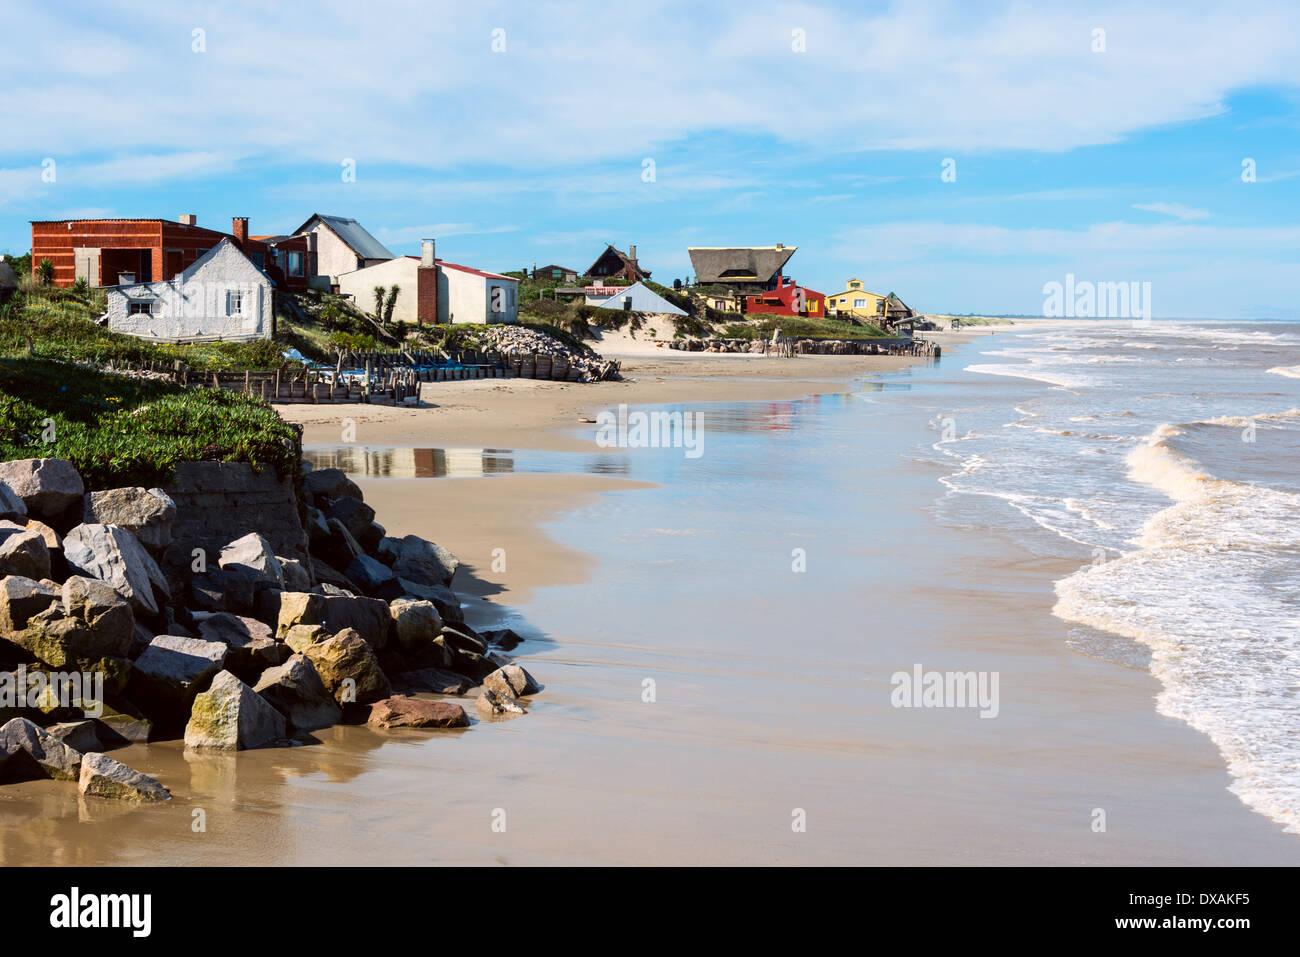 Aguas Dulces Plage de Rocha, Uruguay Photo Stock